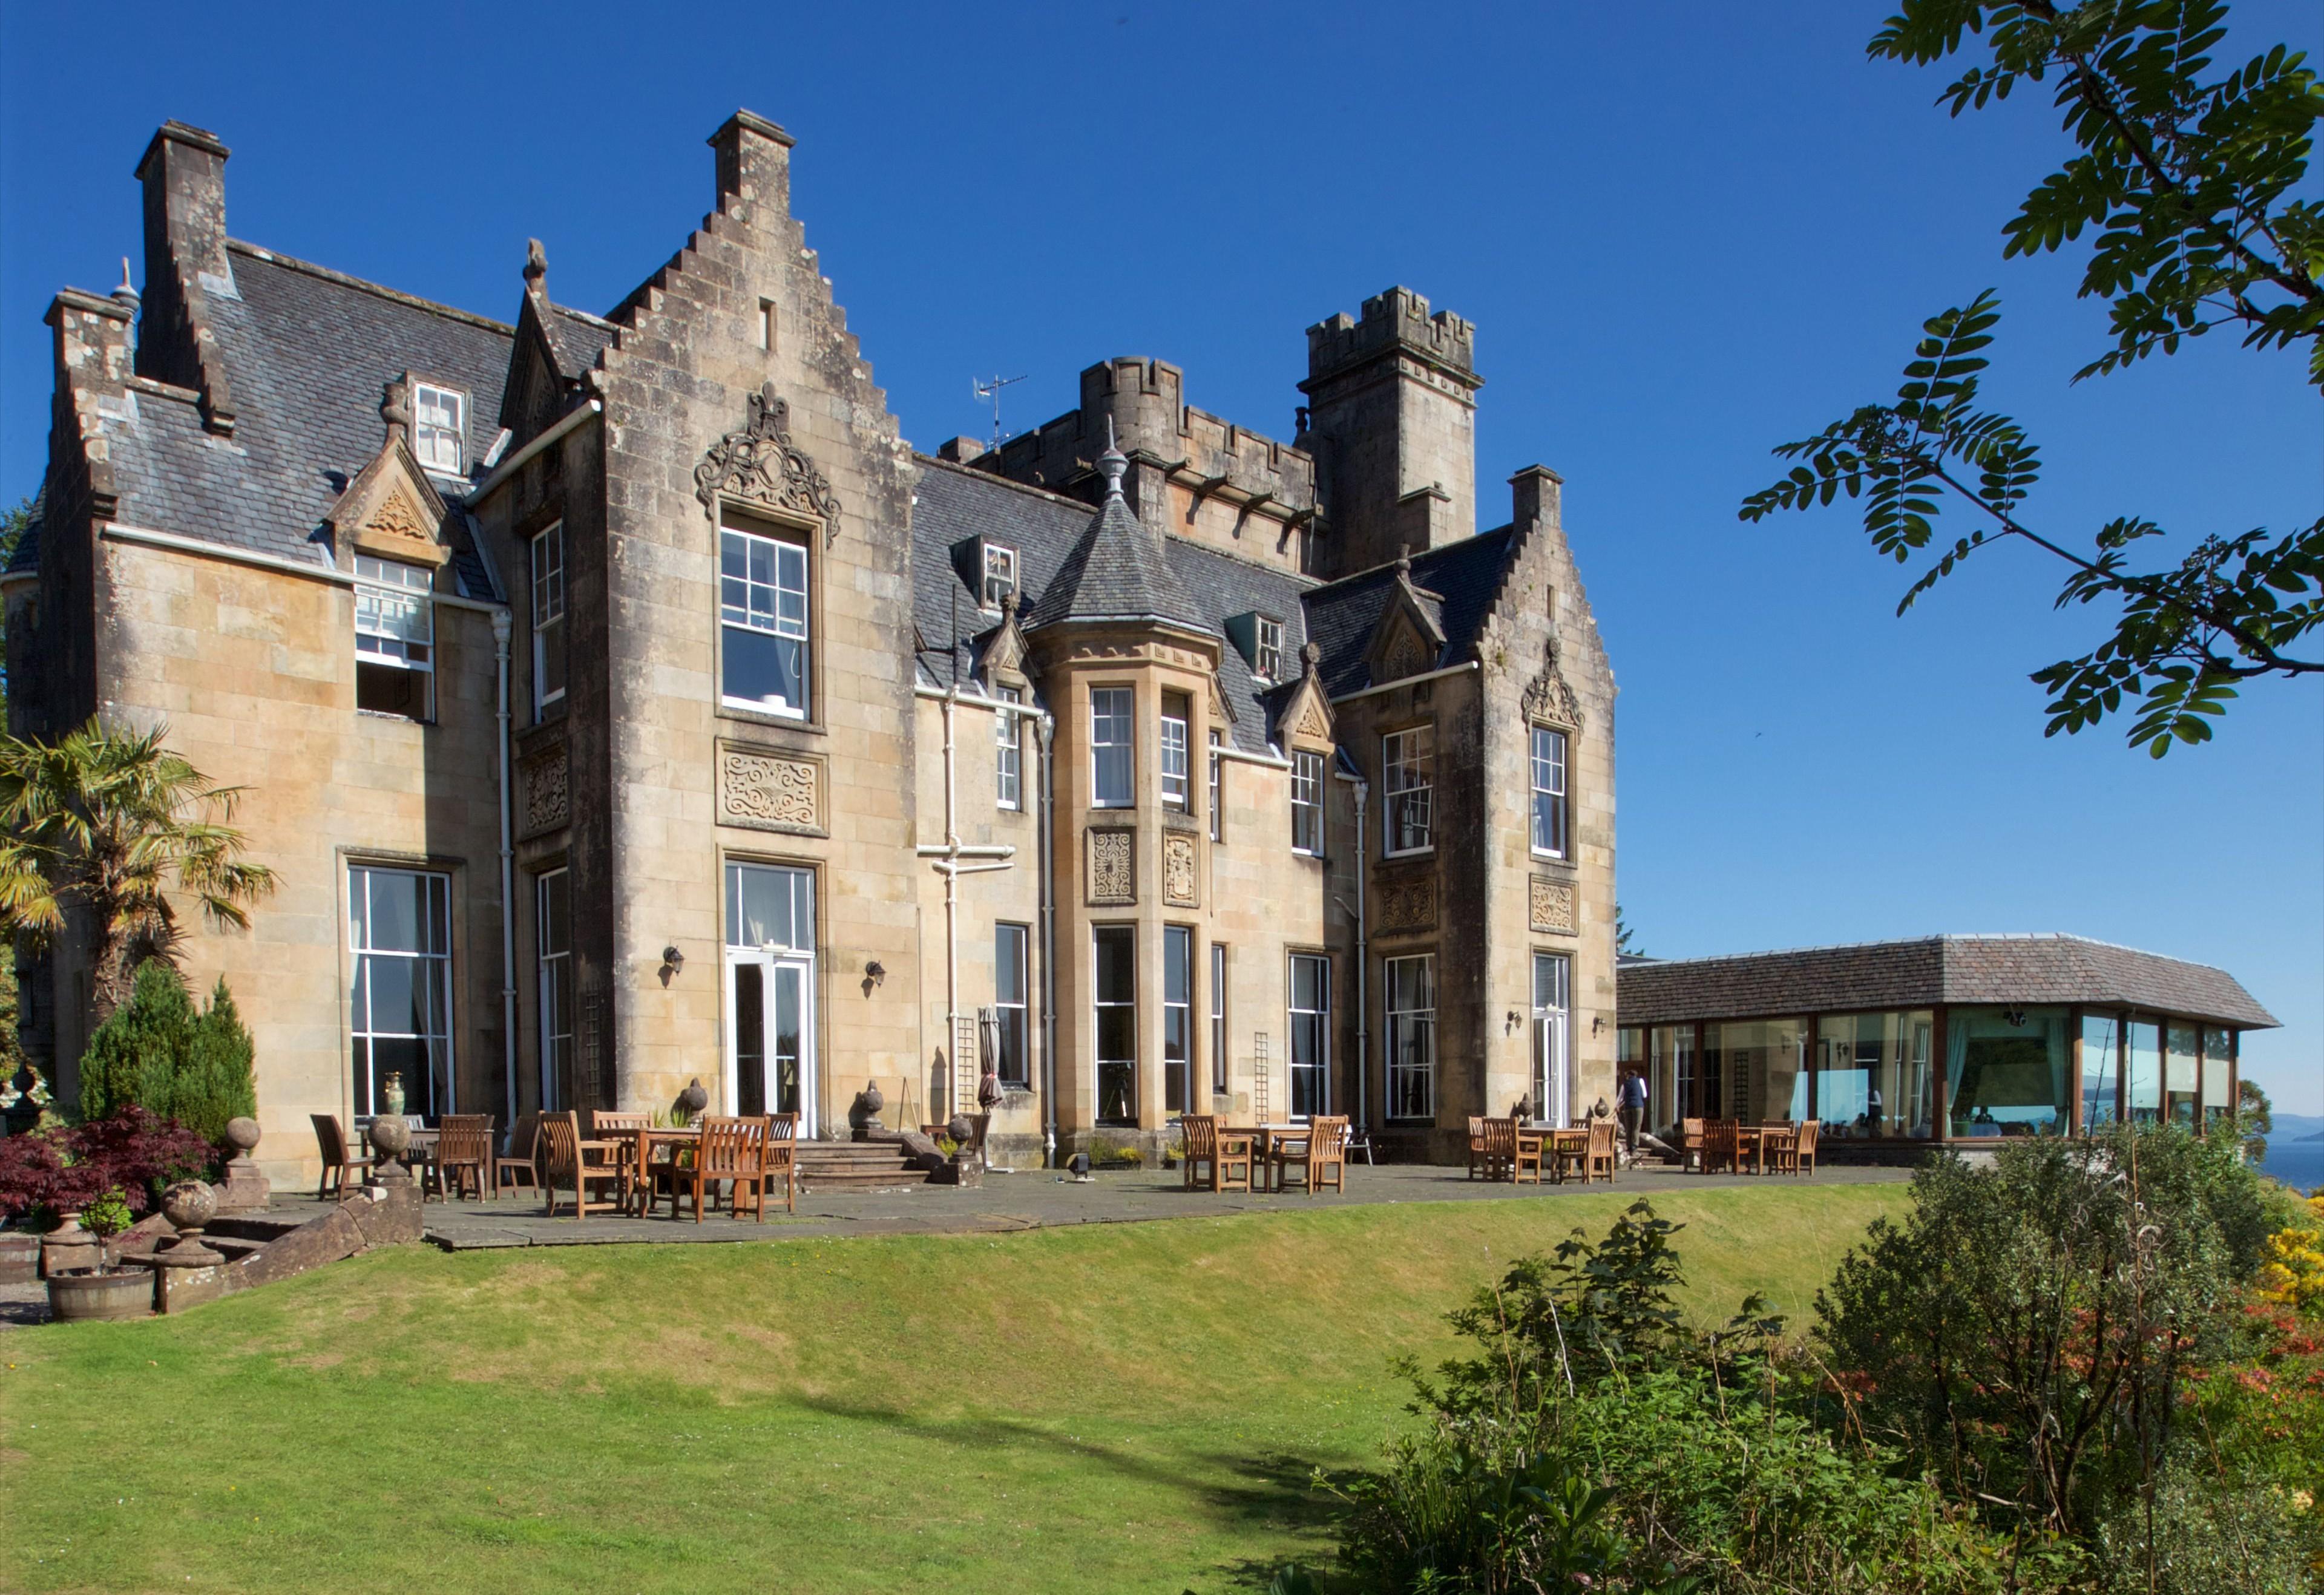 Courtesy of Stonefield Castle Hotel / Expedia